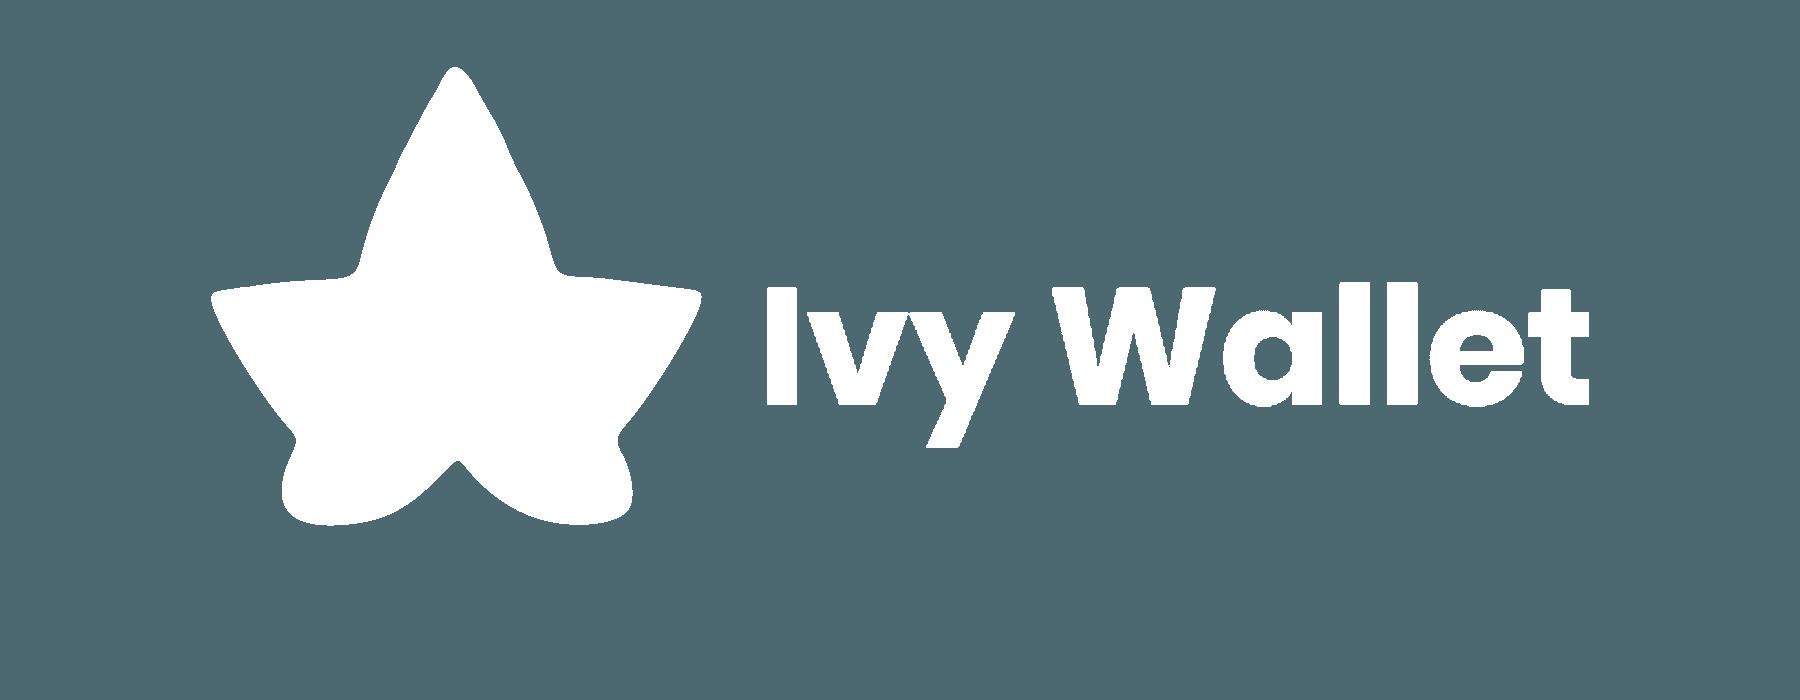 Ivy Wallet Horizontal